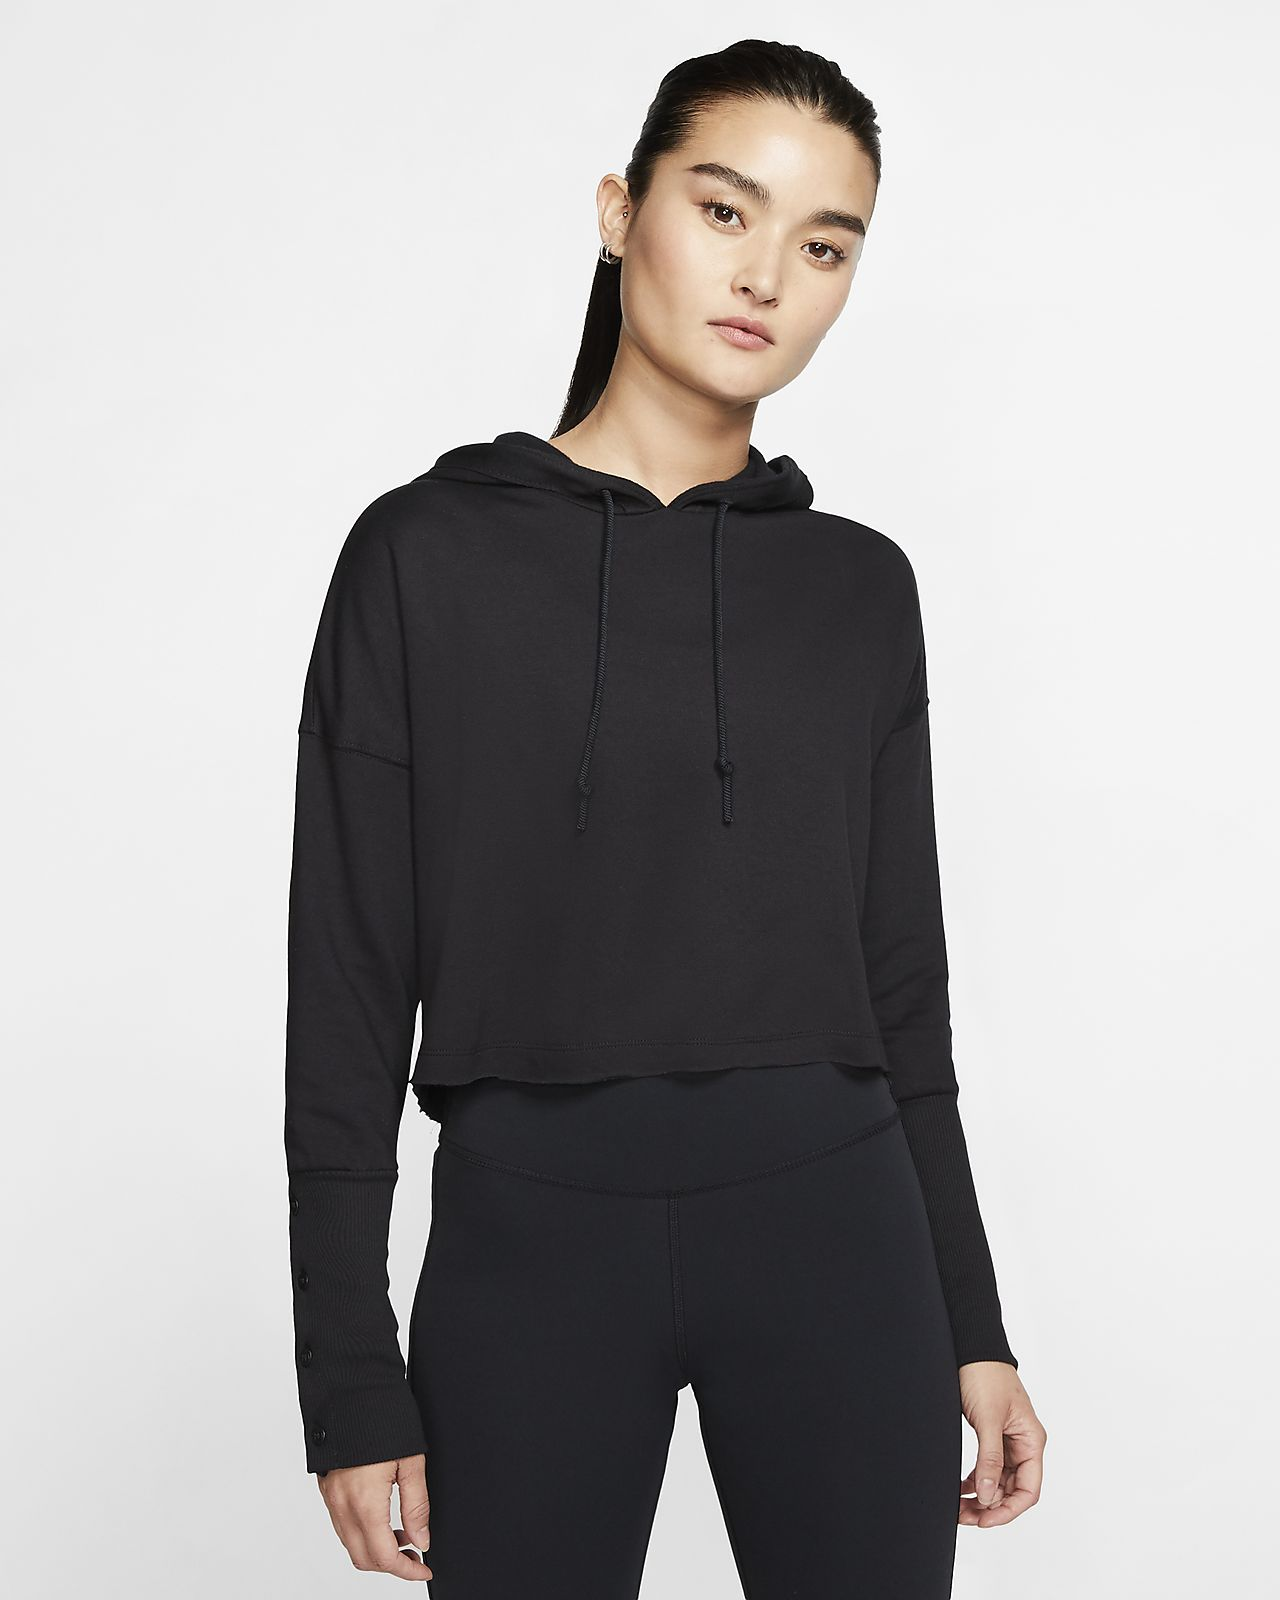 Damska skrócona bluza z kapturem Nike Yoga Luxe